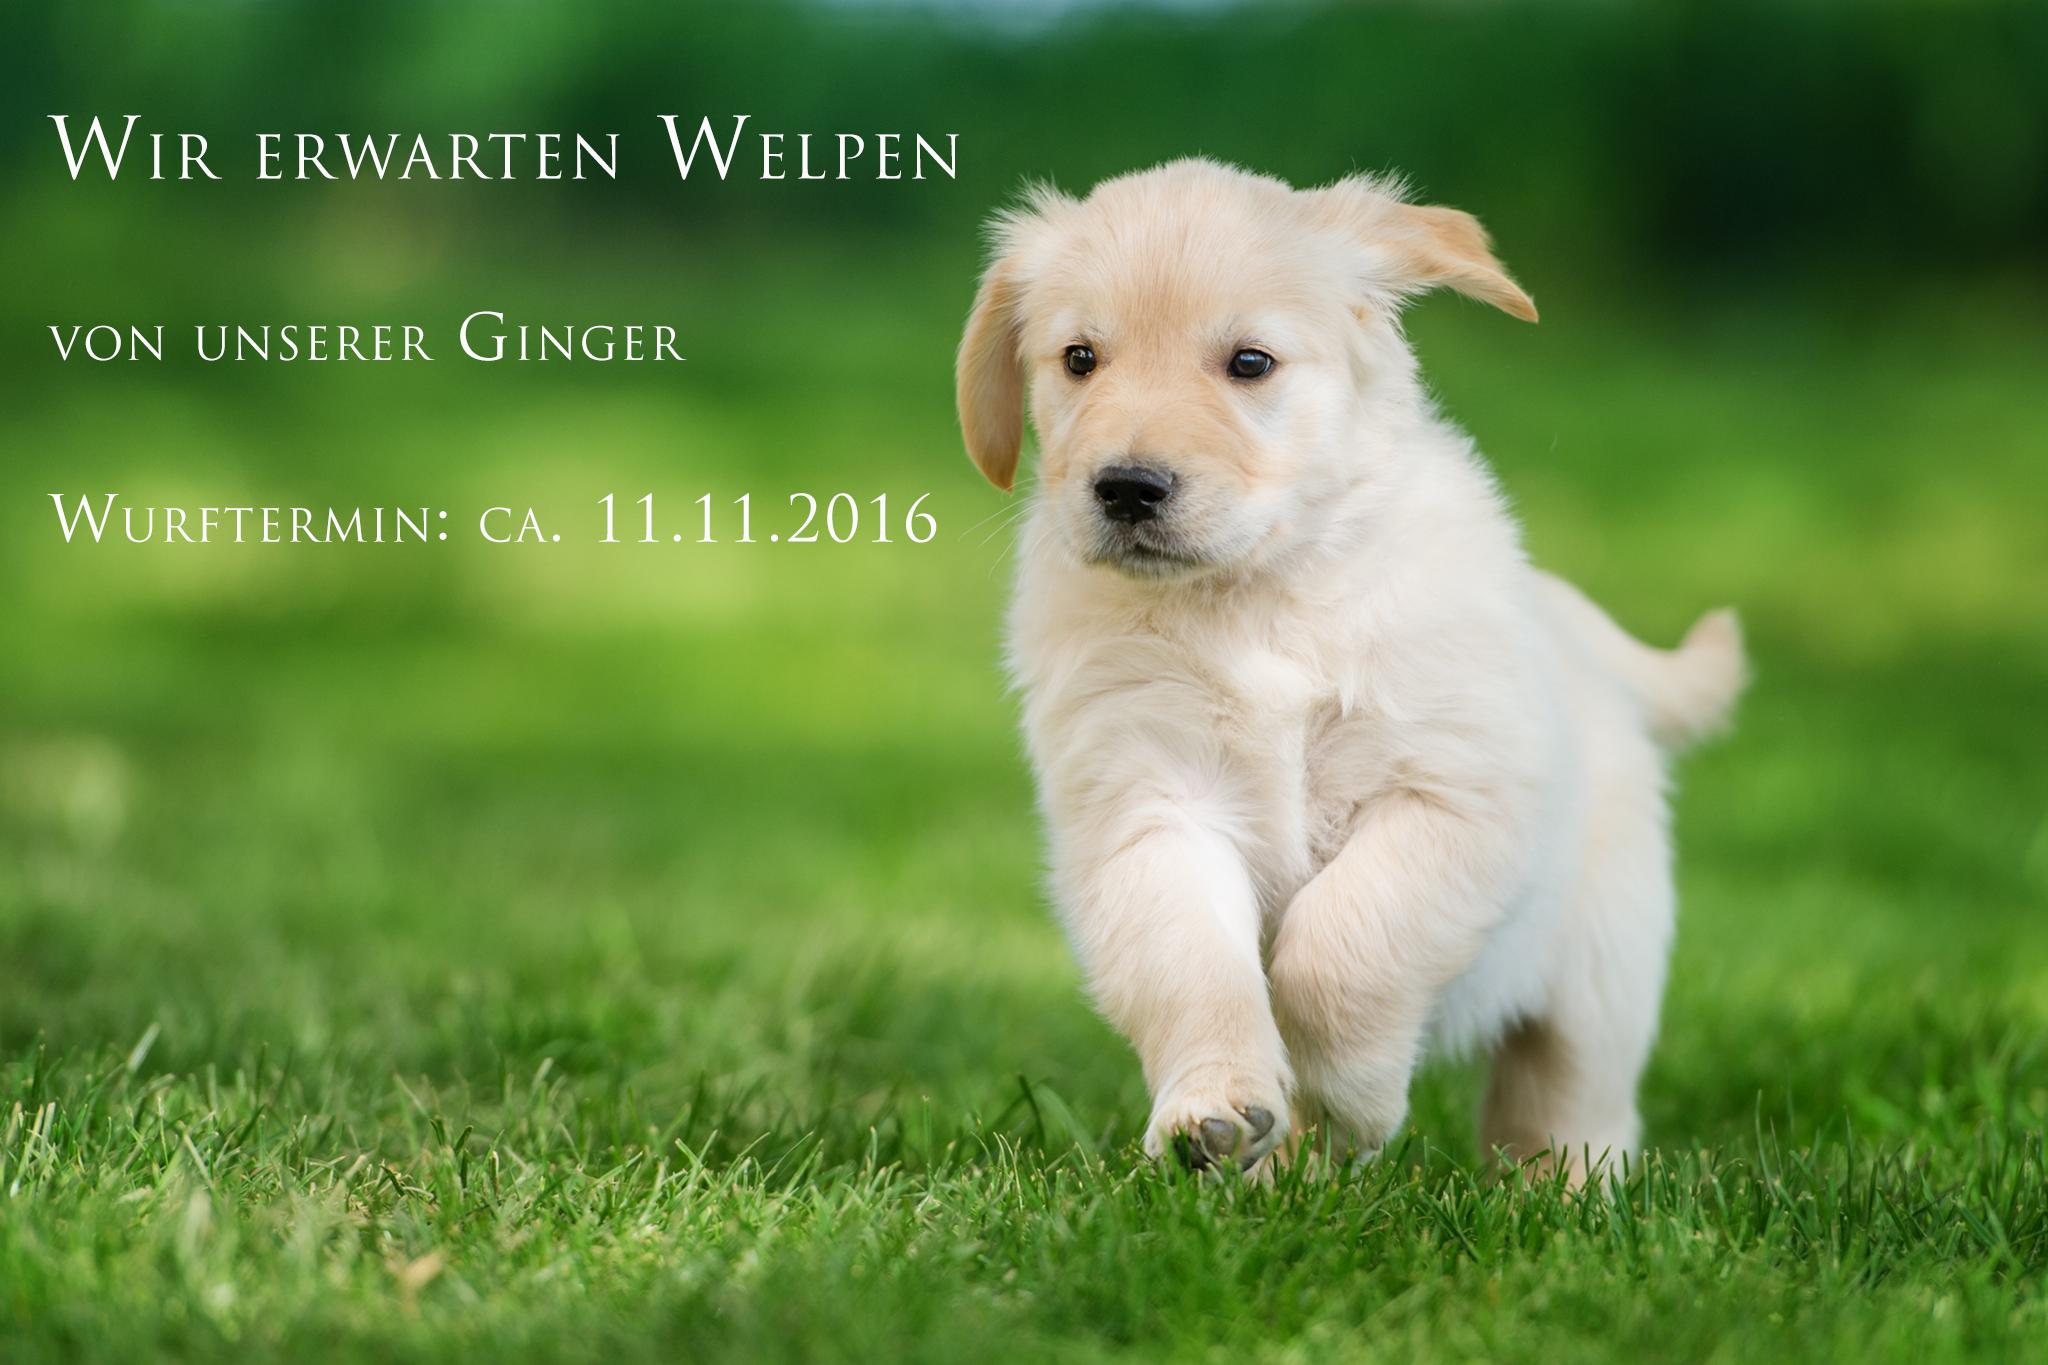 http://goldenretriever-vom-gaelmacker.de/wp-content/uploads/2016/10/DSC_5932-Kopie.png